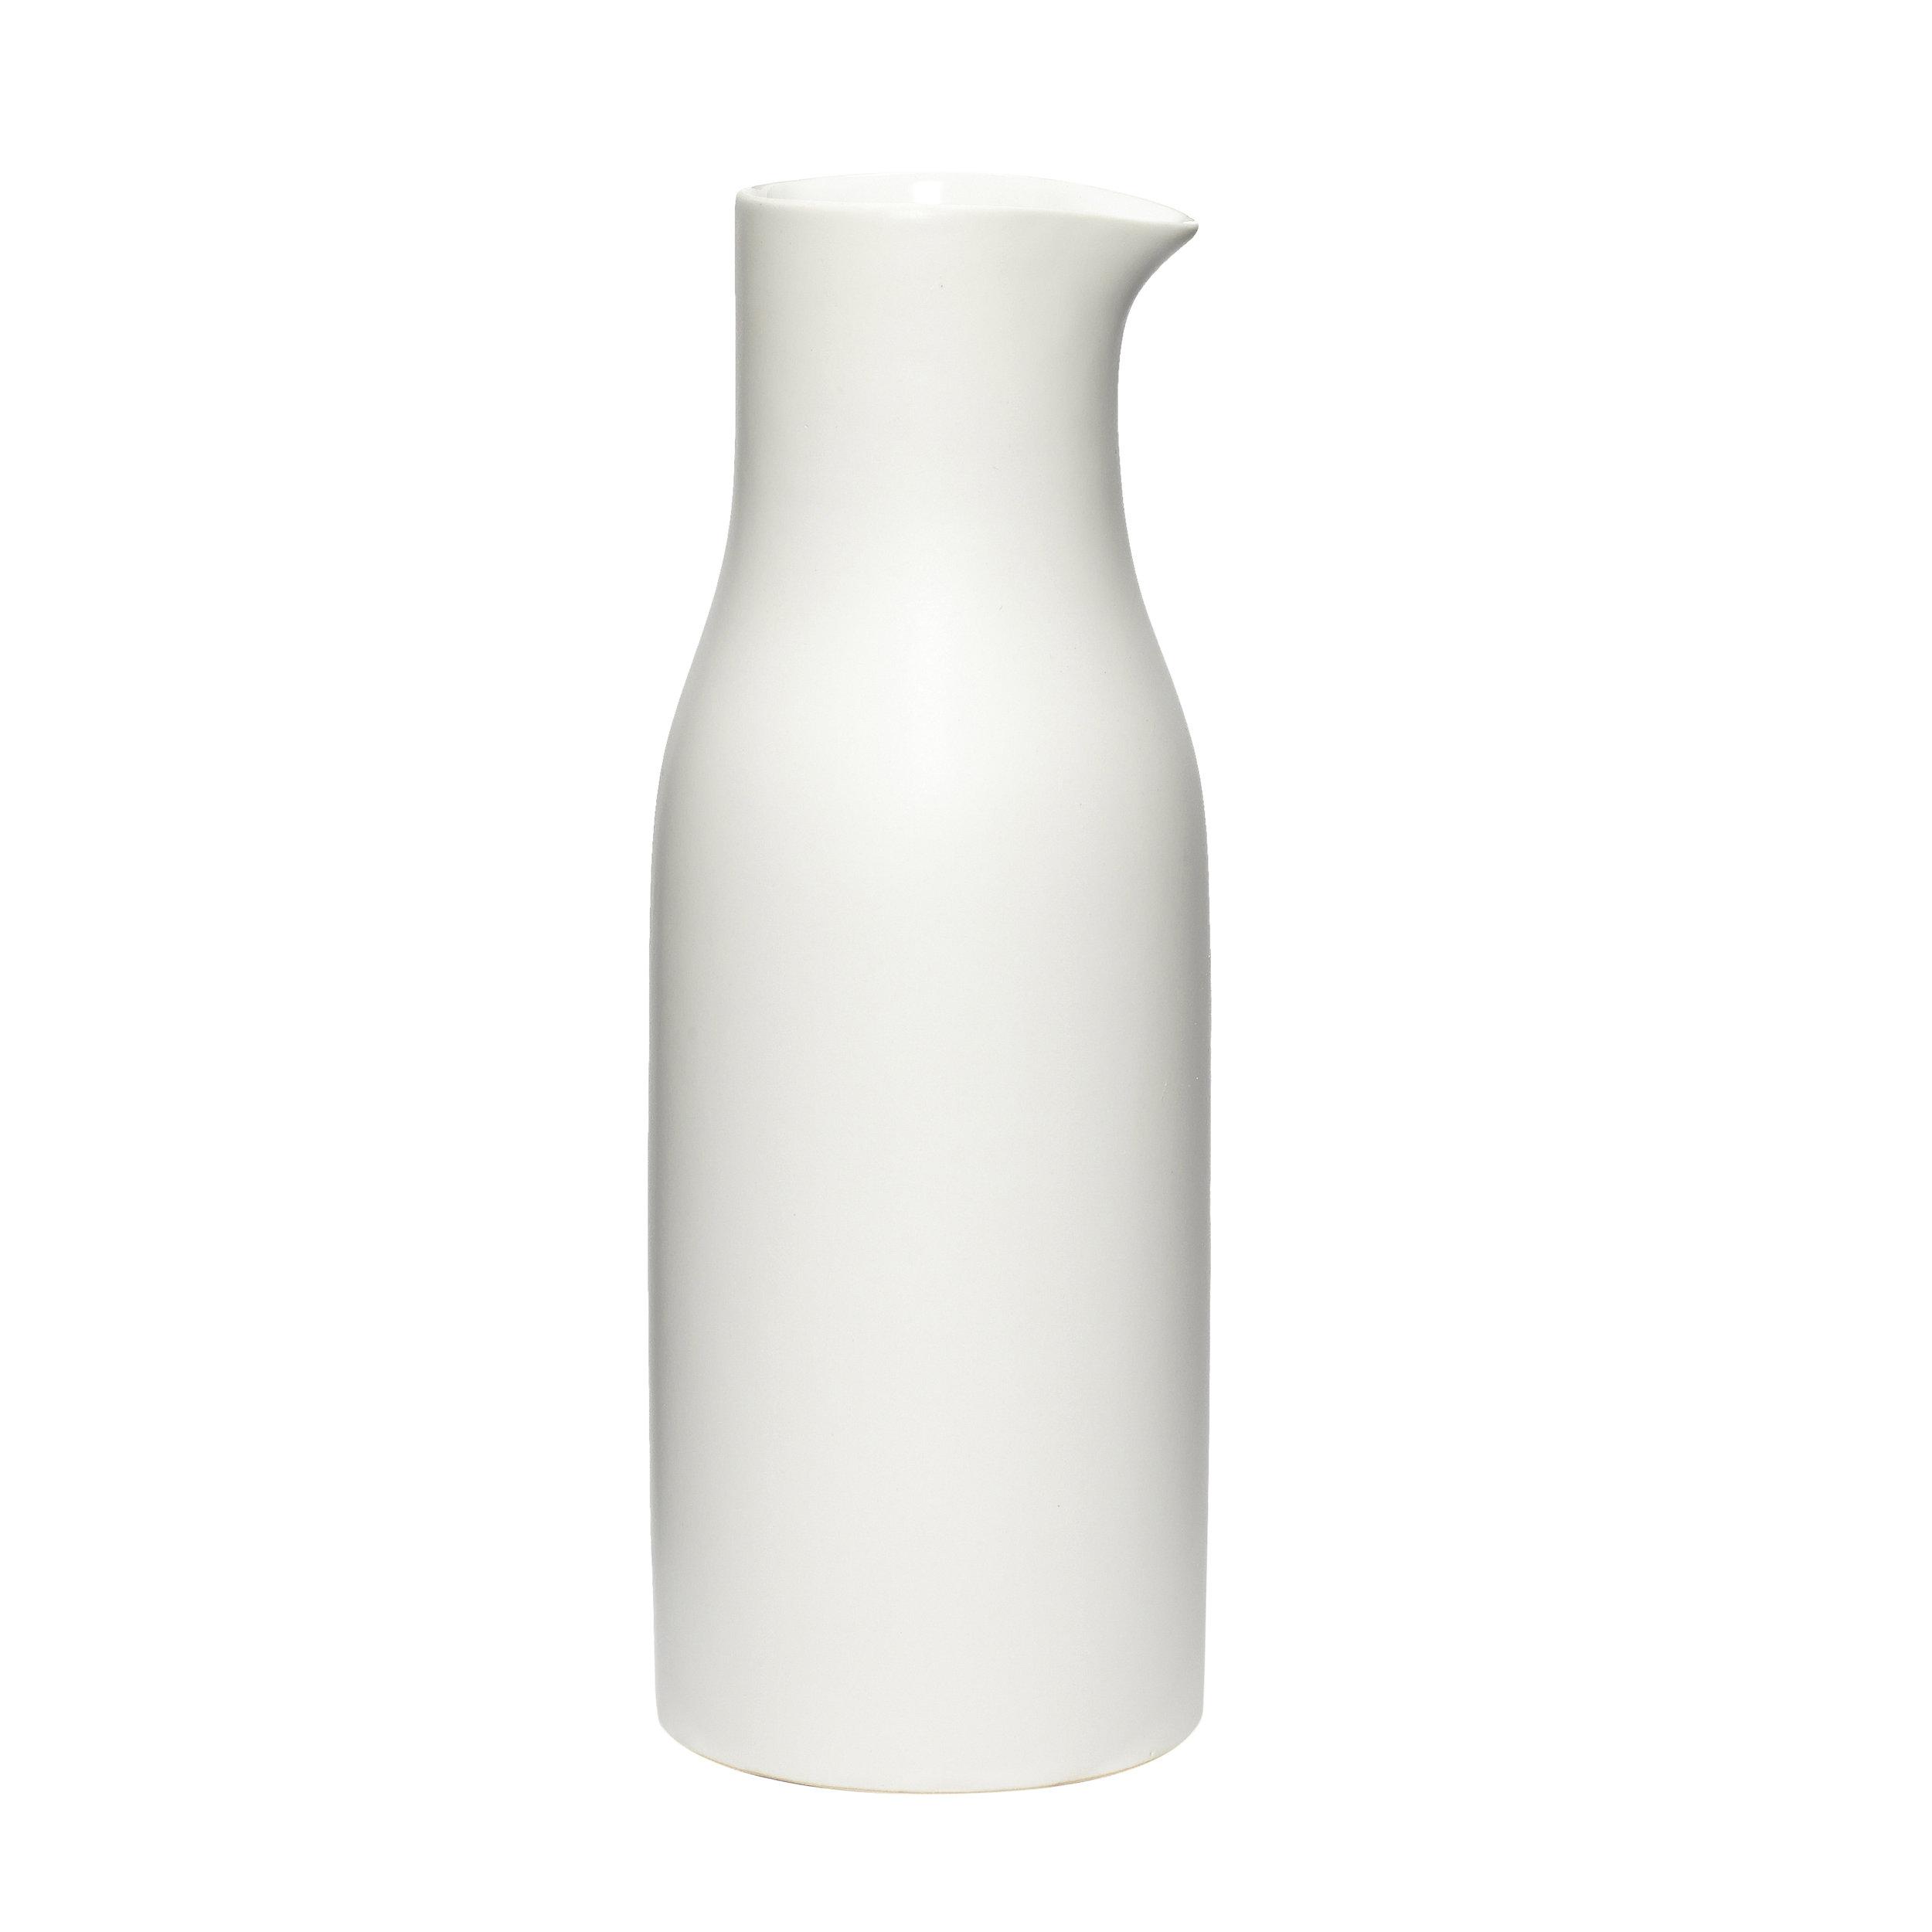 #023   White Porcelain Water Jug   10cm x H26cm Hire Price - £6.50 Minimum Order 5 Current Stock Available 12